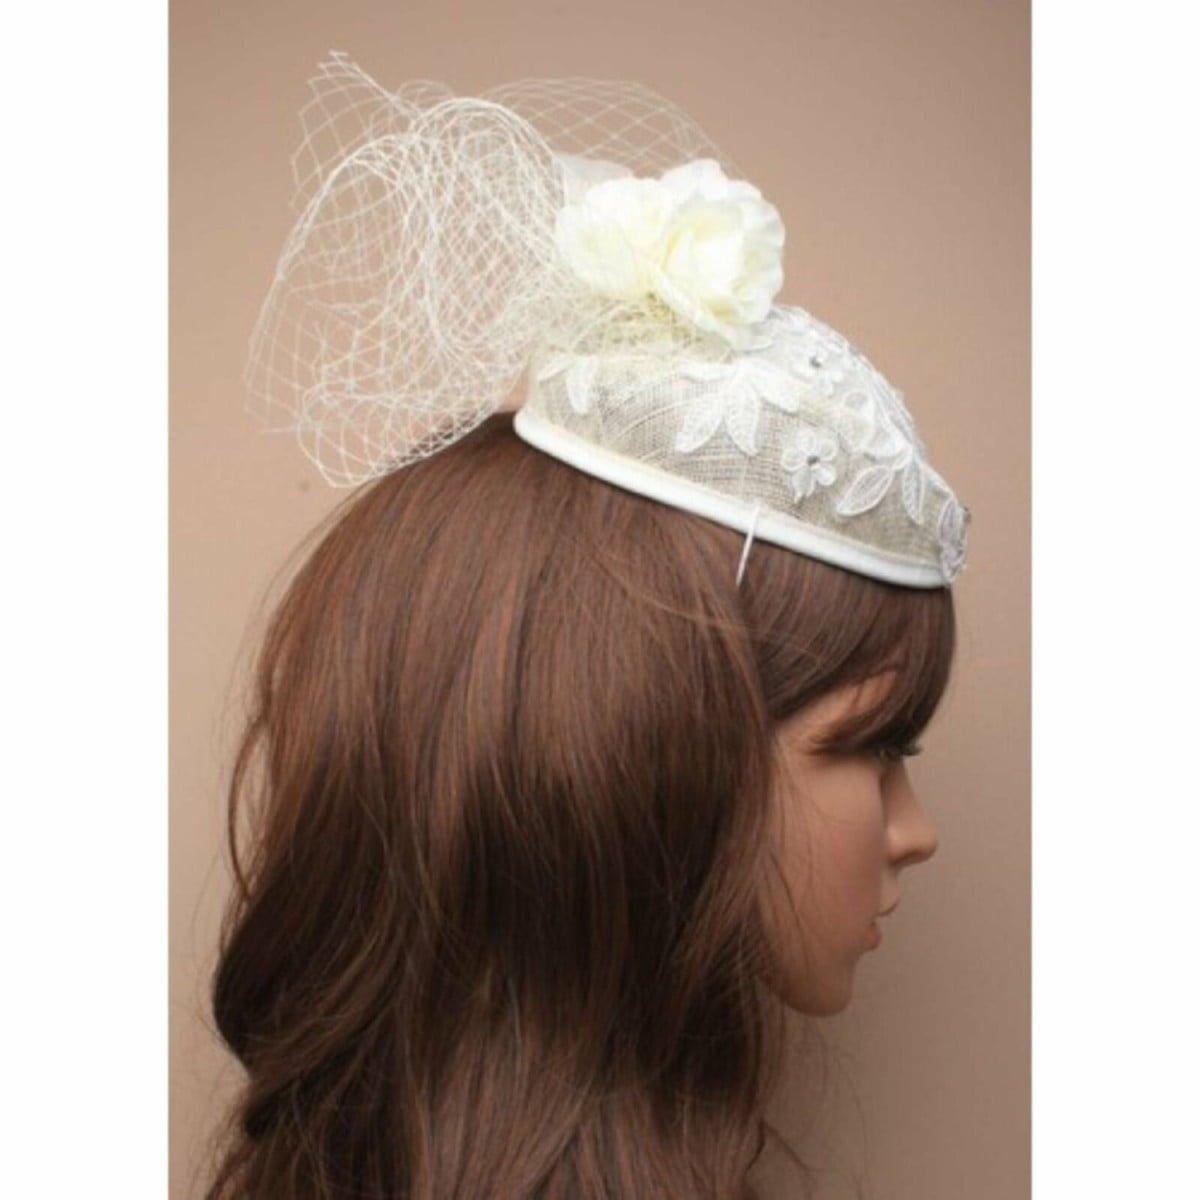 White wedding fascinator with rhinestone detailing 1